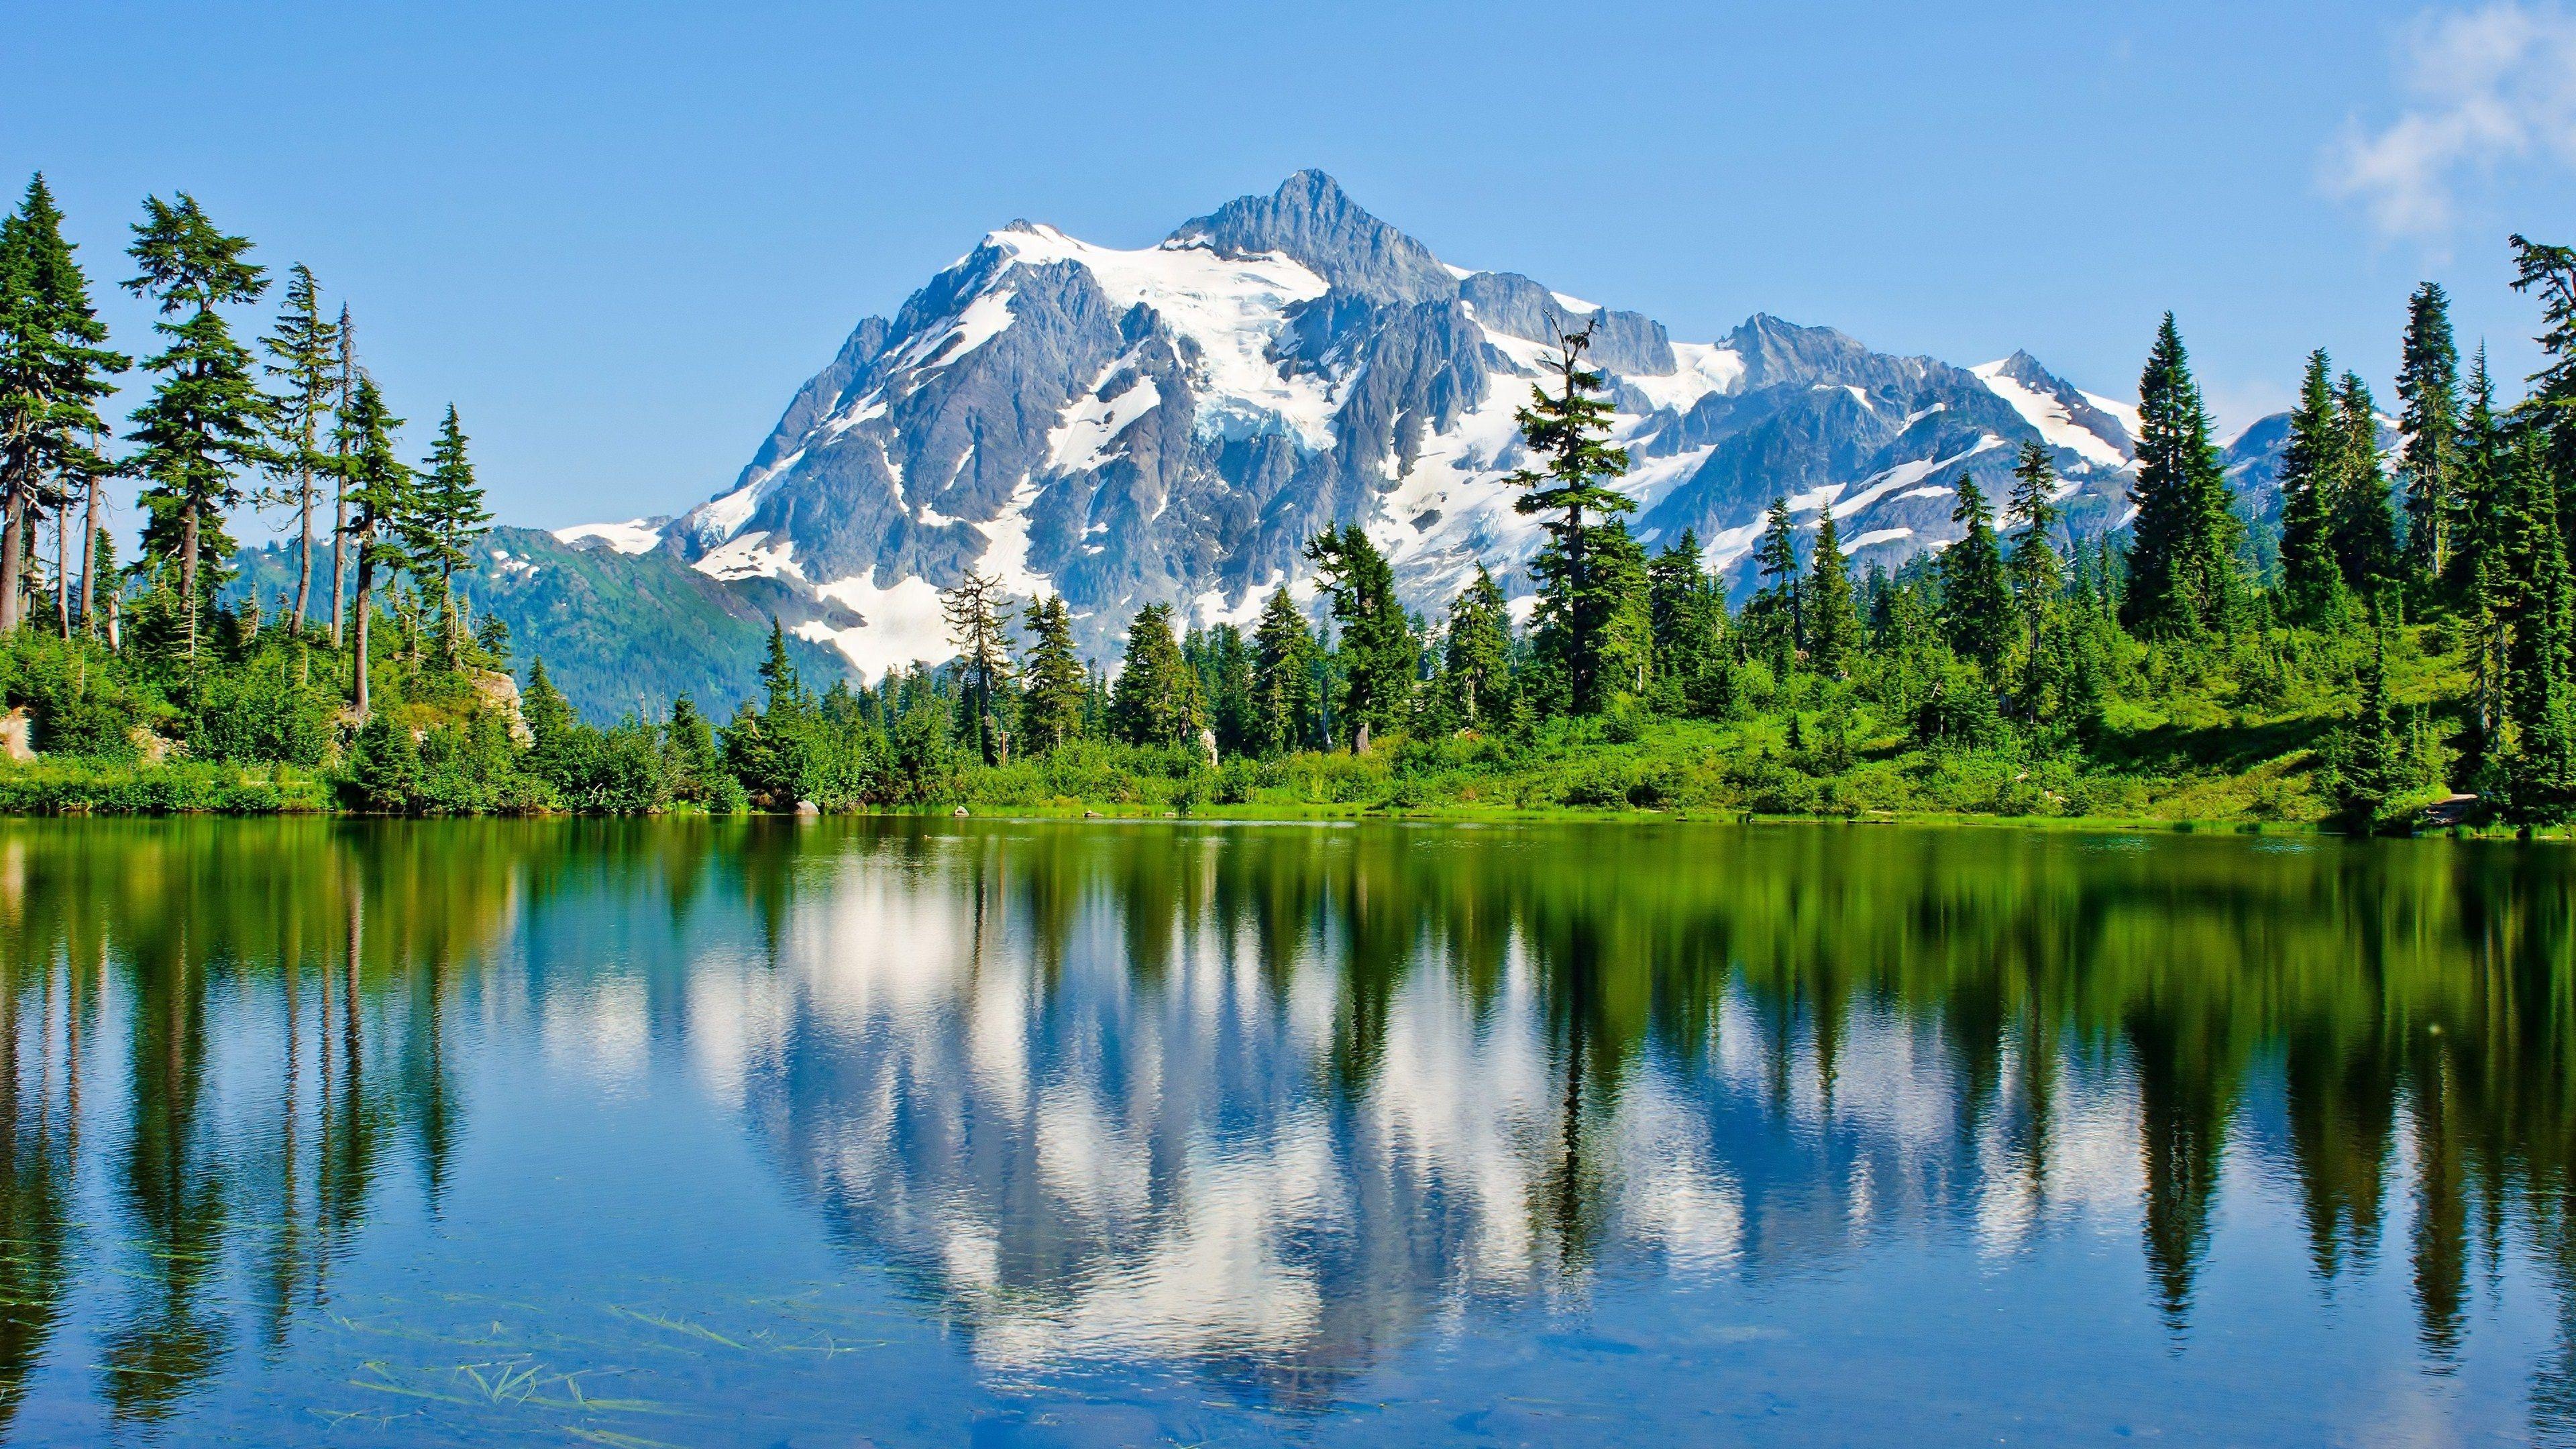 Mount Baker Forest Lake 4k Ultra Hd Wallpaper Beautiful Scenery Pictures Landscape Wallpaper Nature Wallpaper